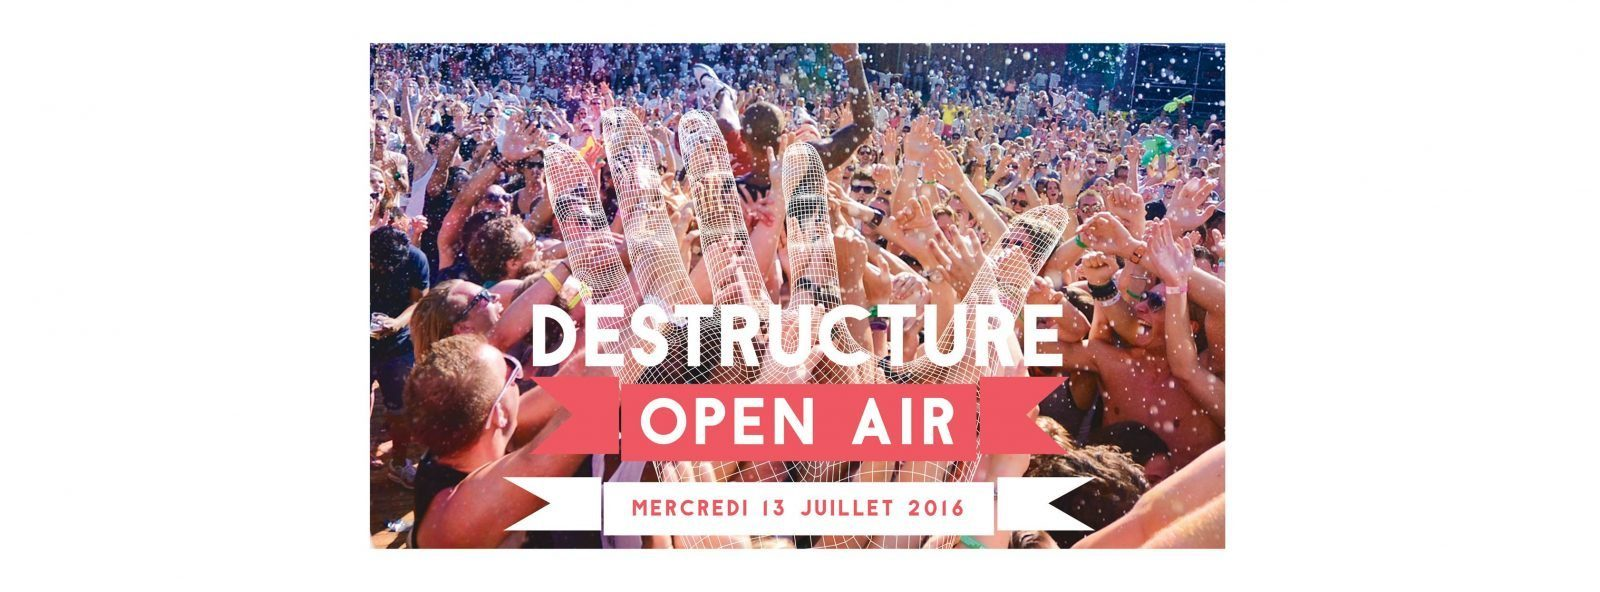 cover event ninkasi open air destructuré